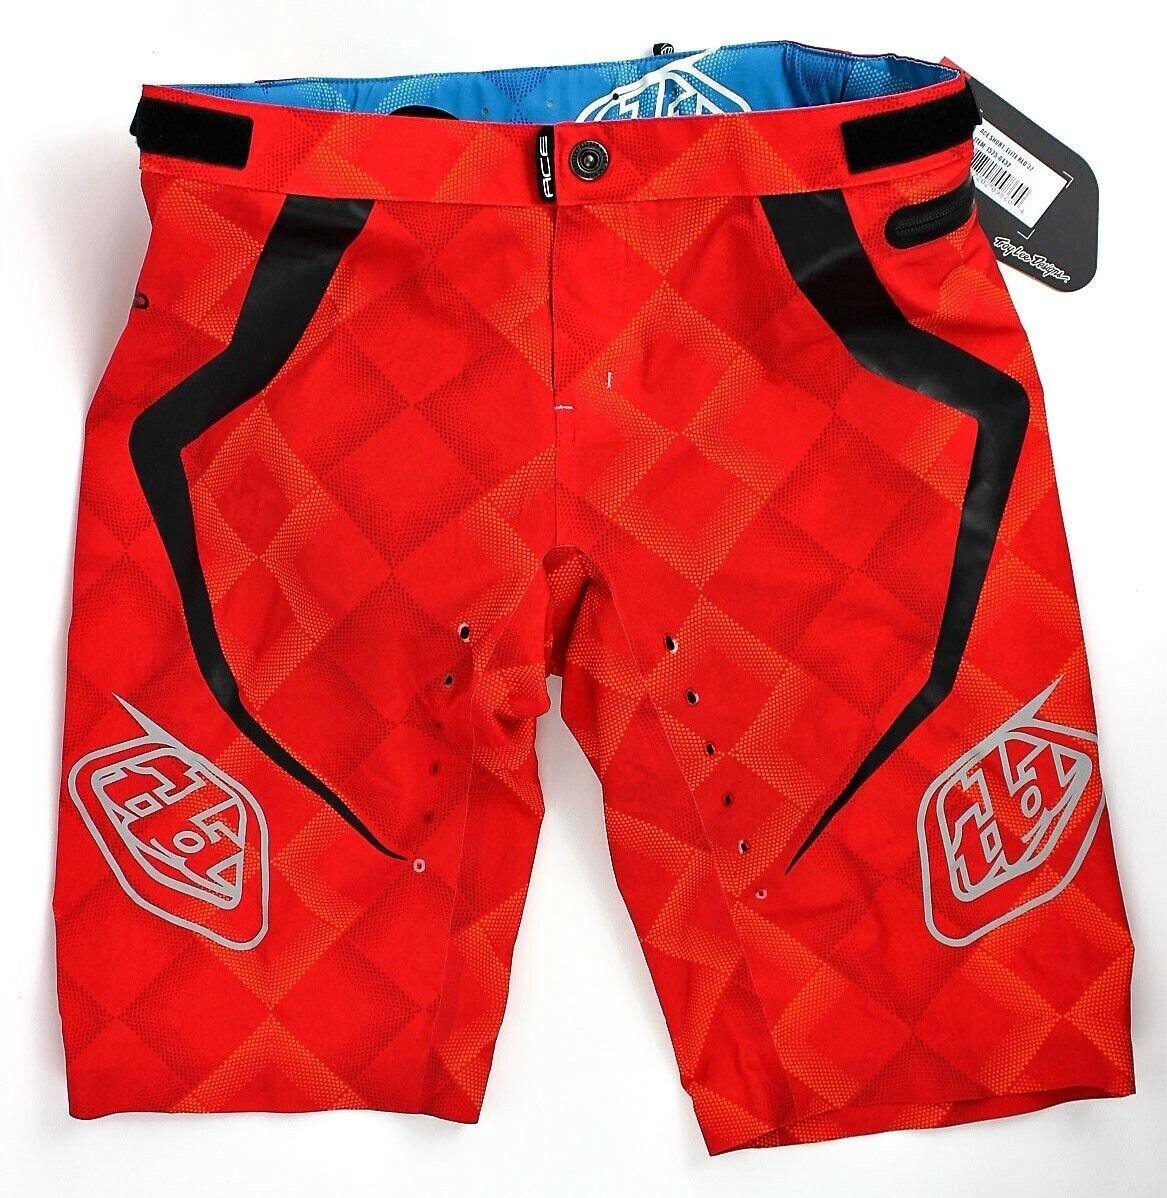 Troy Lee Designs Ace Men's BMX Bike Shorts - Elite Red   Size 36